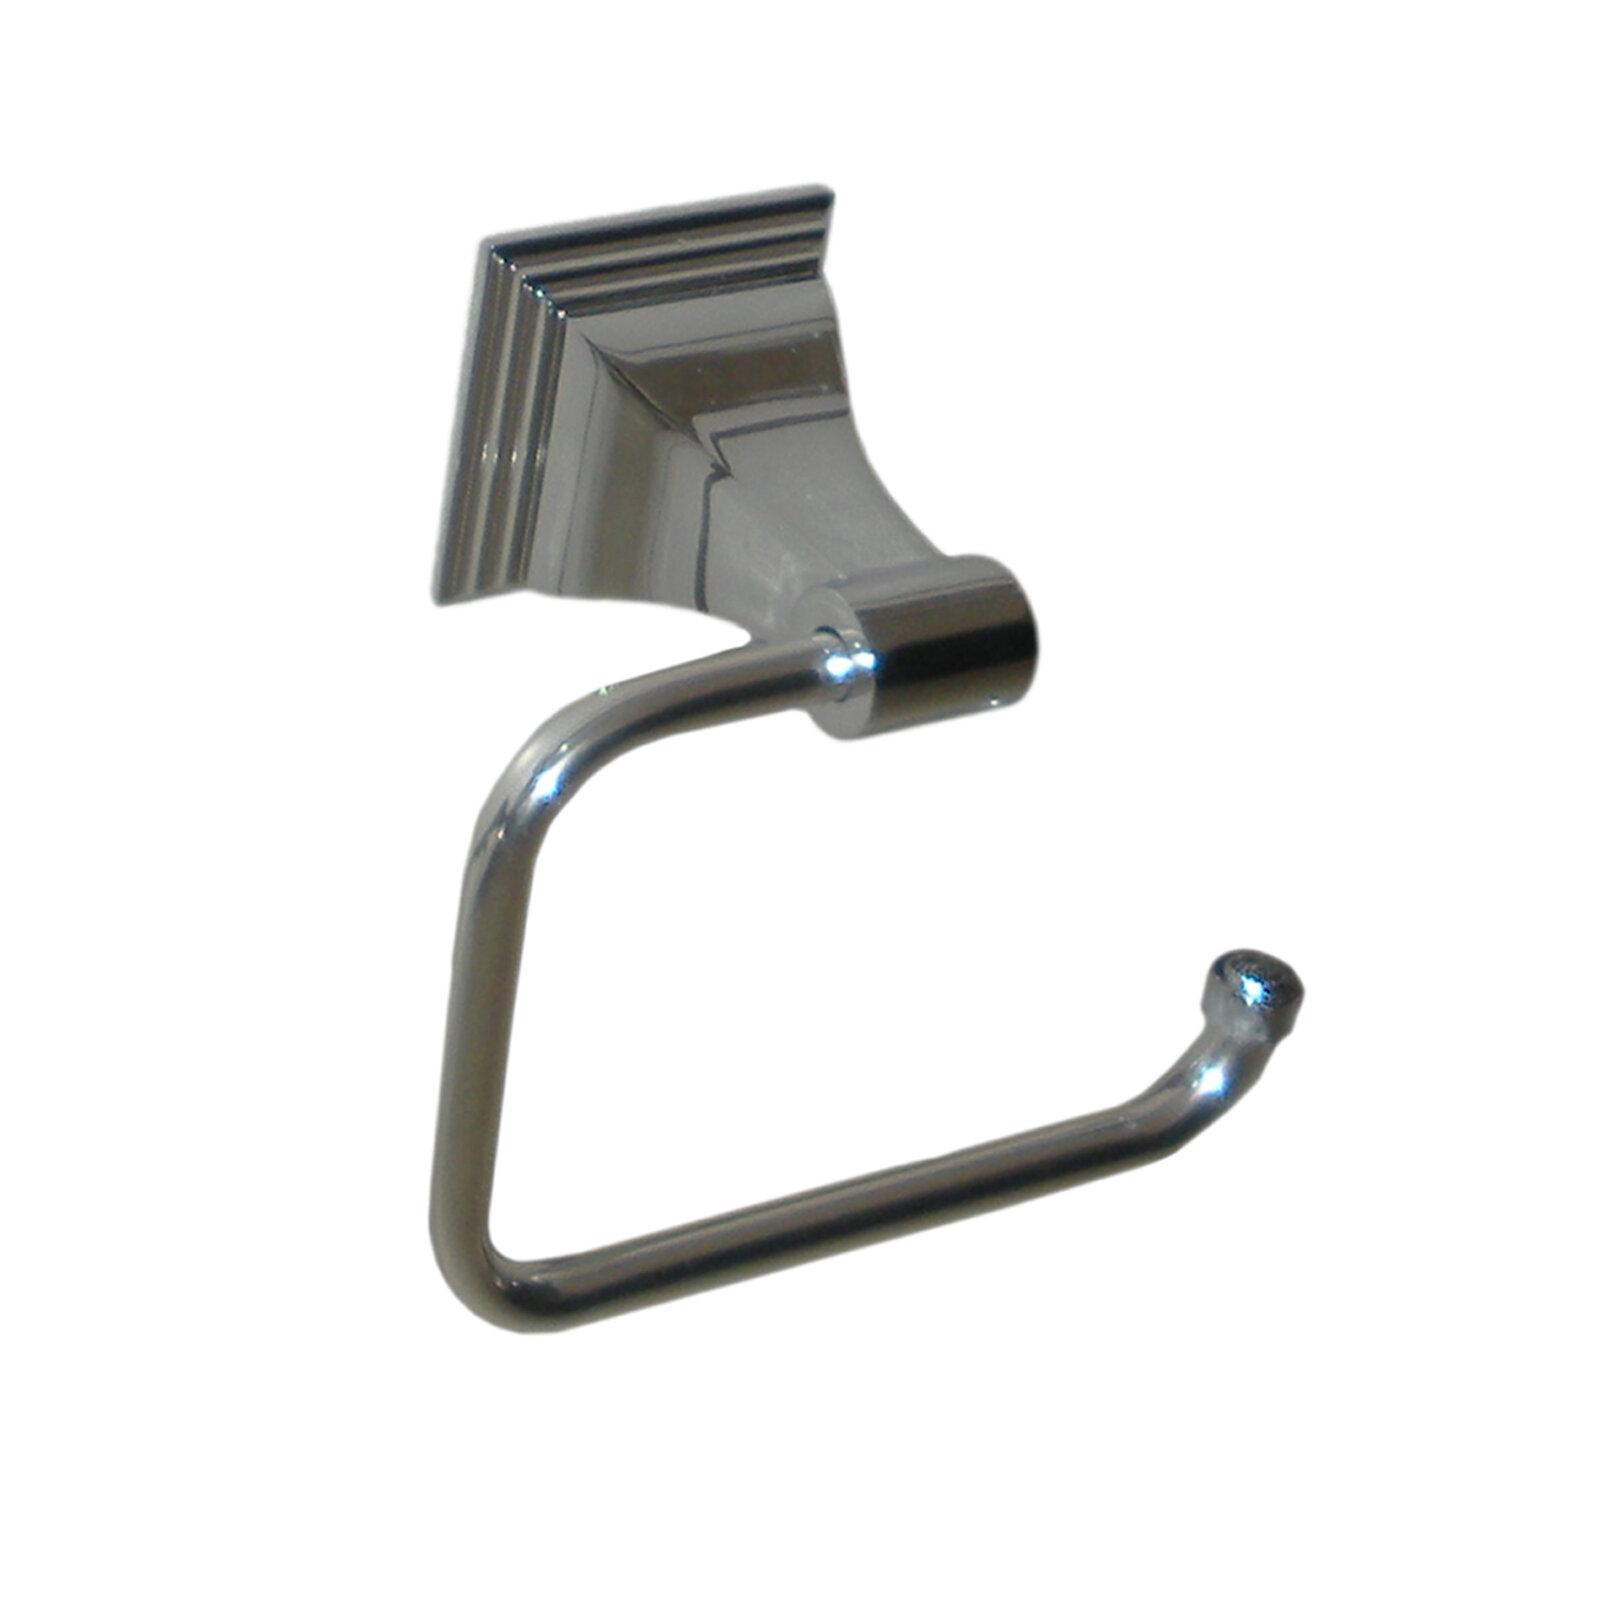 ARISTA Leonard Wall Mounted Toilet Paper Holder EBay